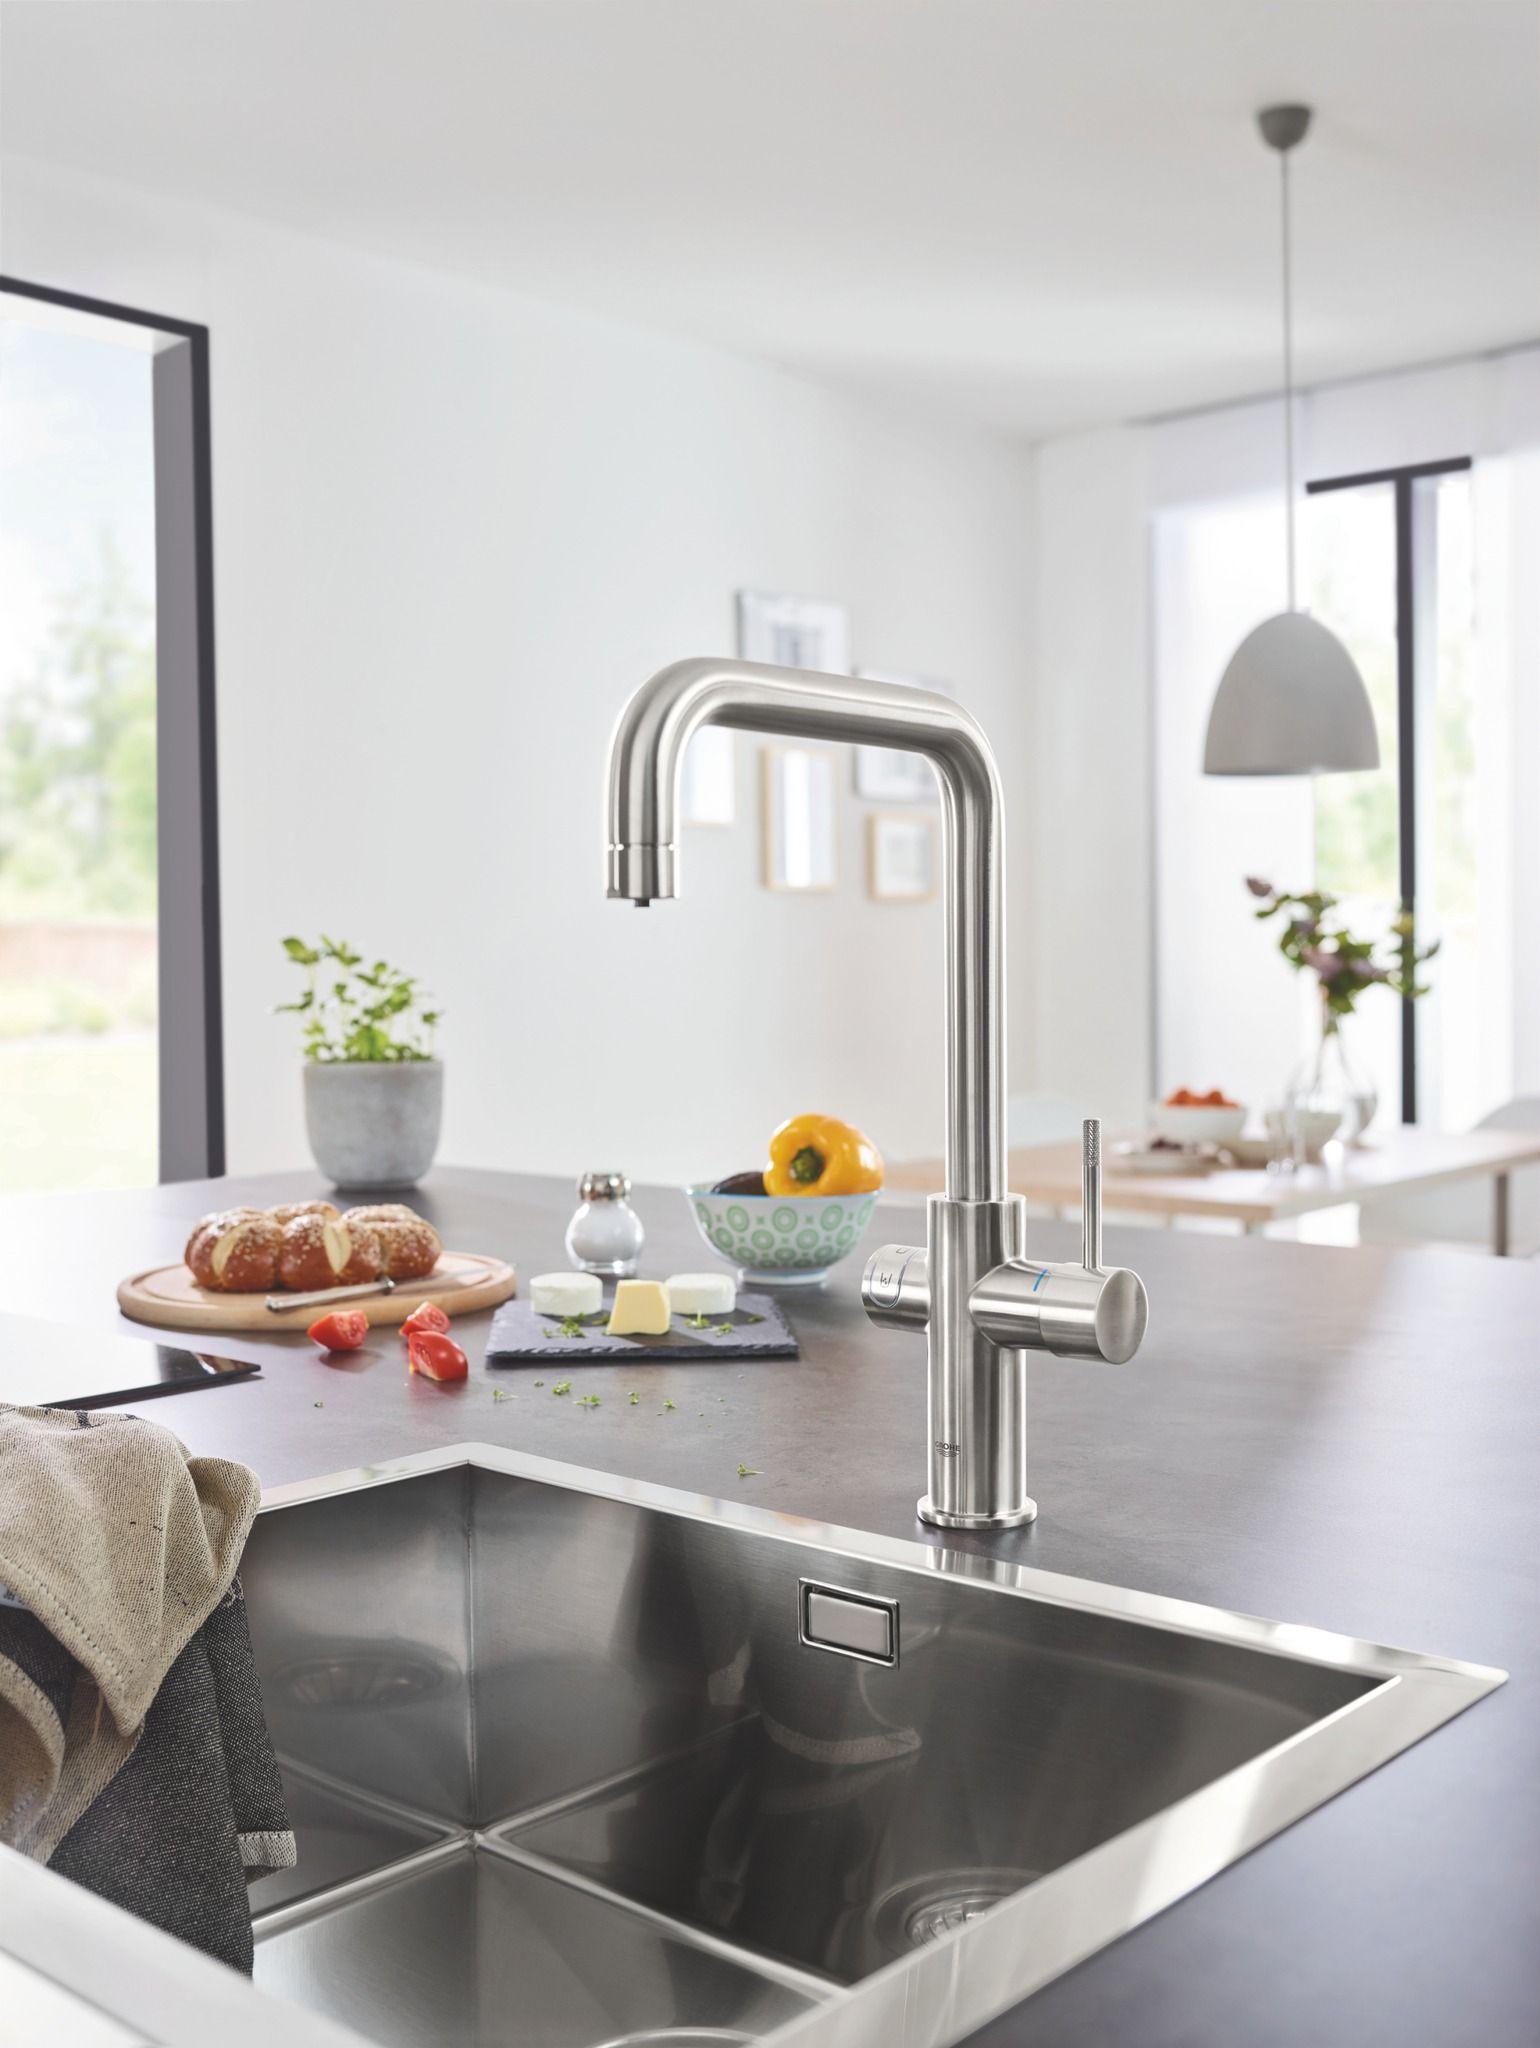 Leitungswasser Als Geschmackserlebnis Grohe Blue Home Kuchenarmatur Grohe Blue Kuchenarmaturen